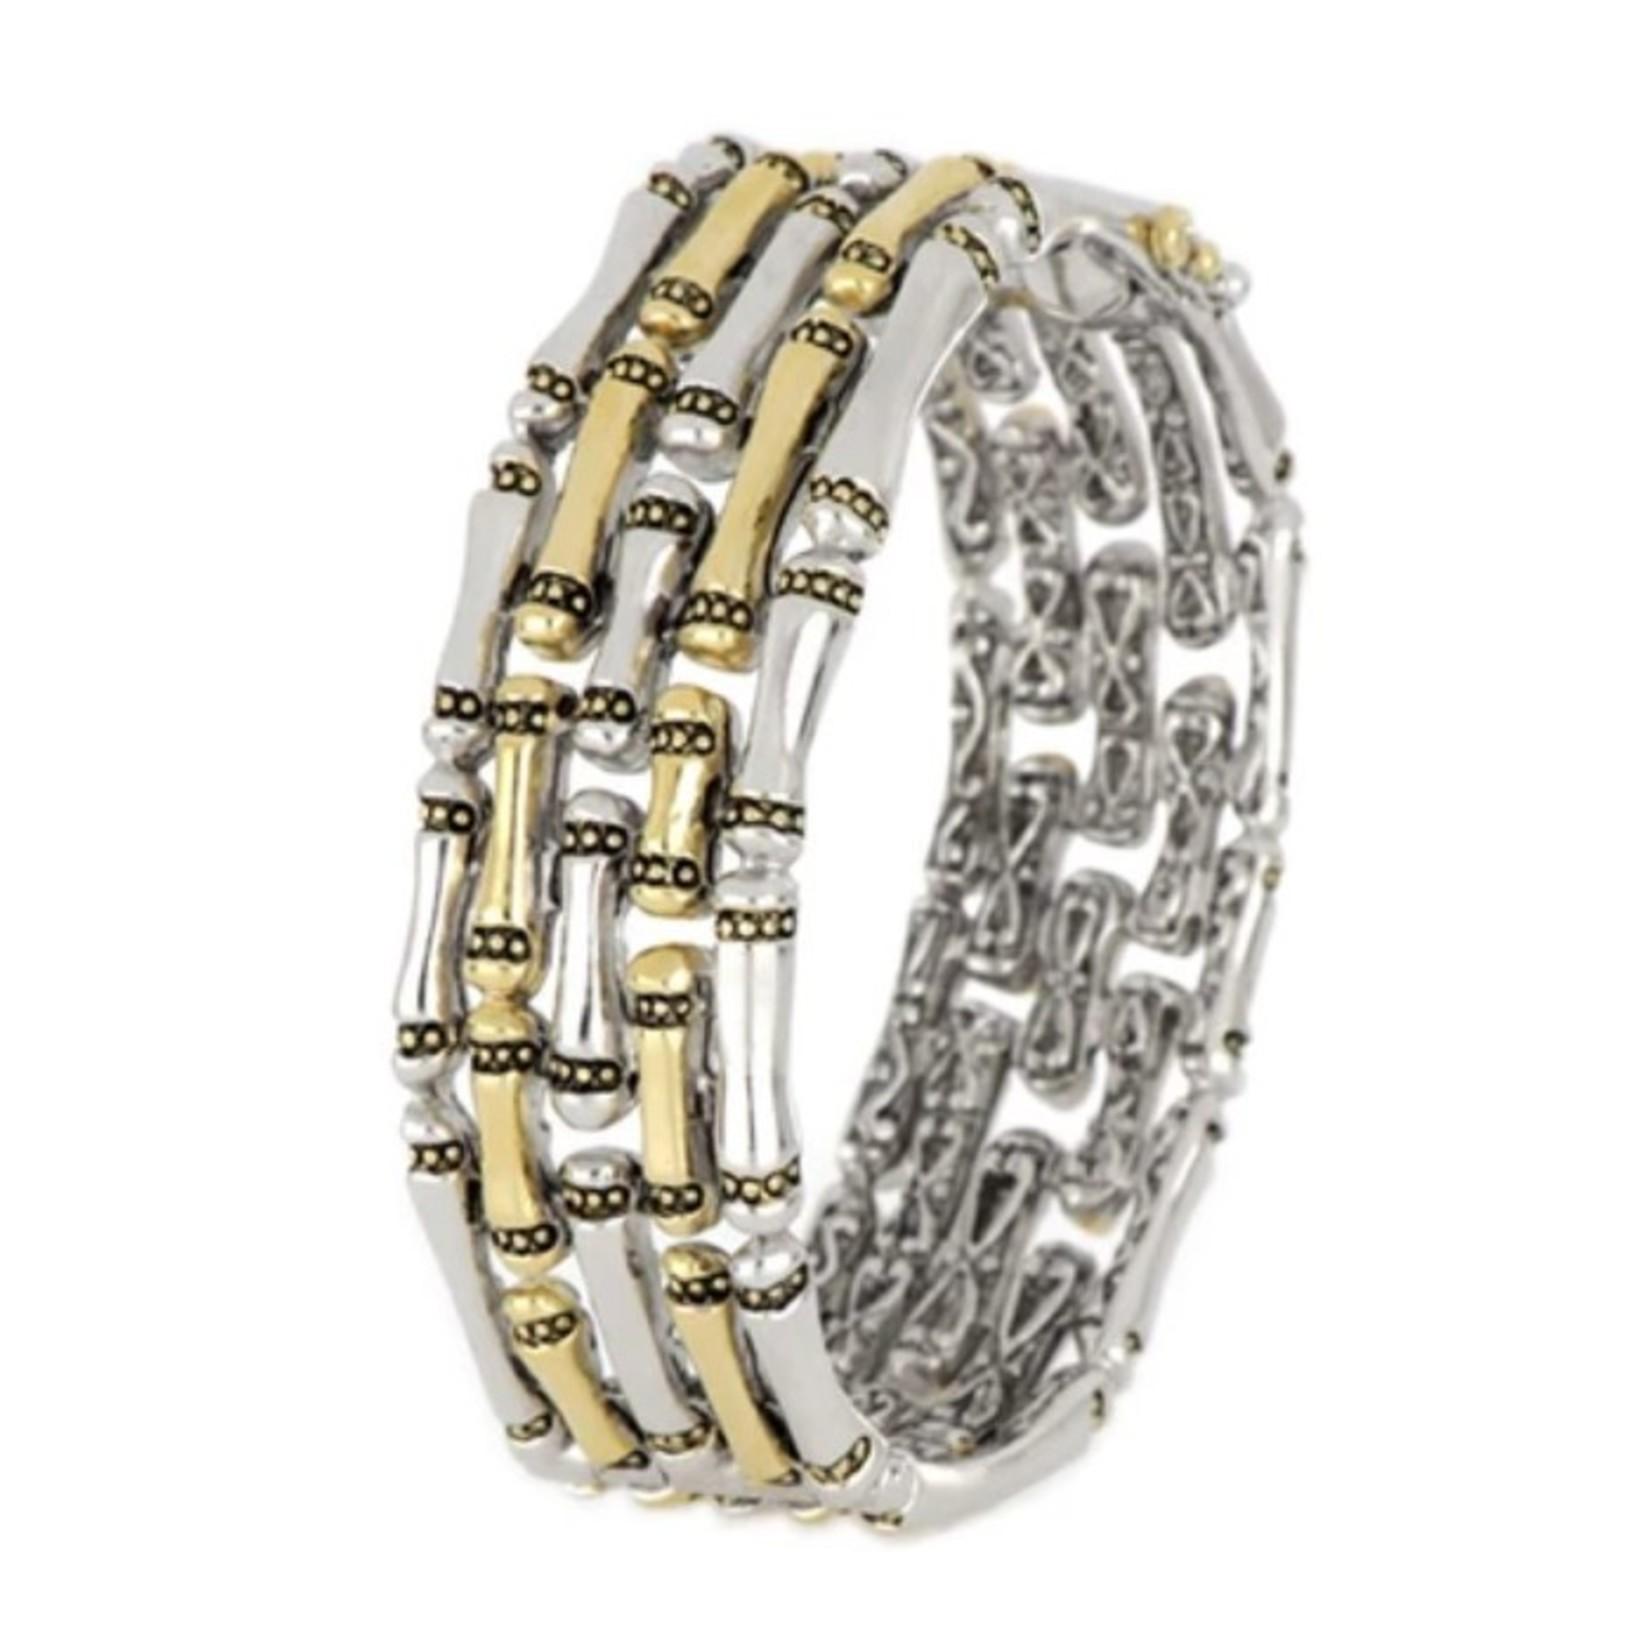 John Medeiros John Mederios Canias 5 Row Hinged Bracelet